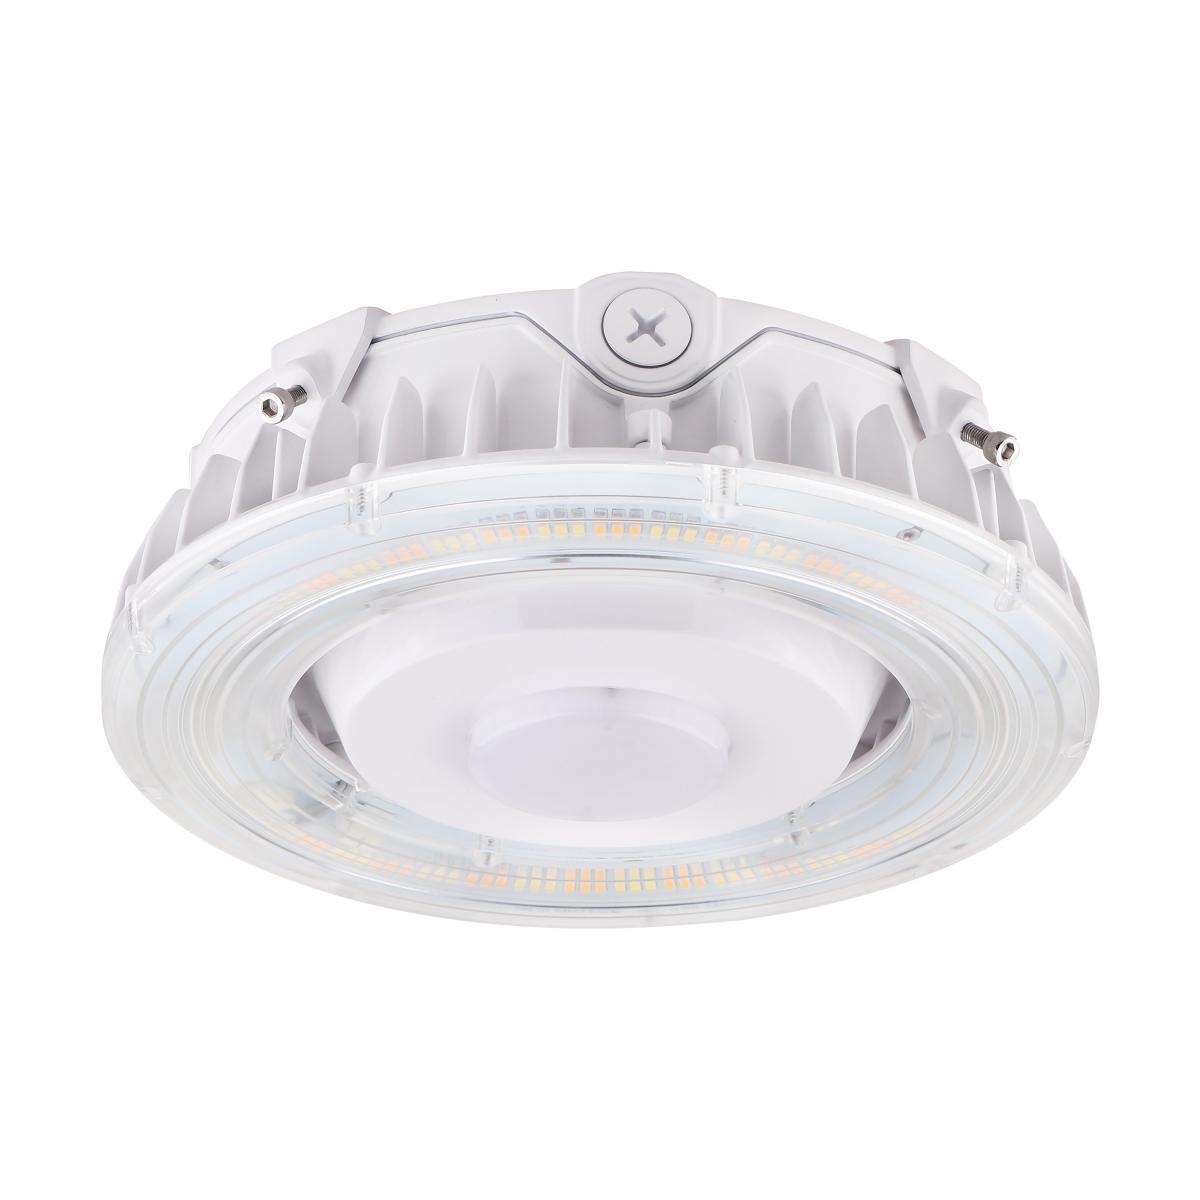 65-623 25W LED CANOPY LIGHT